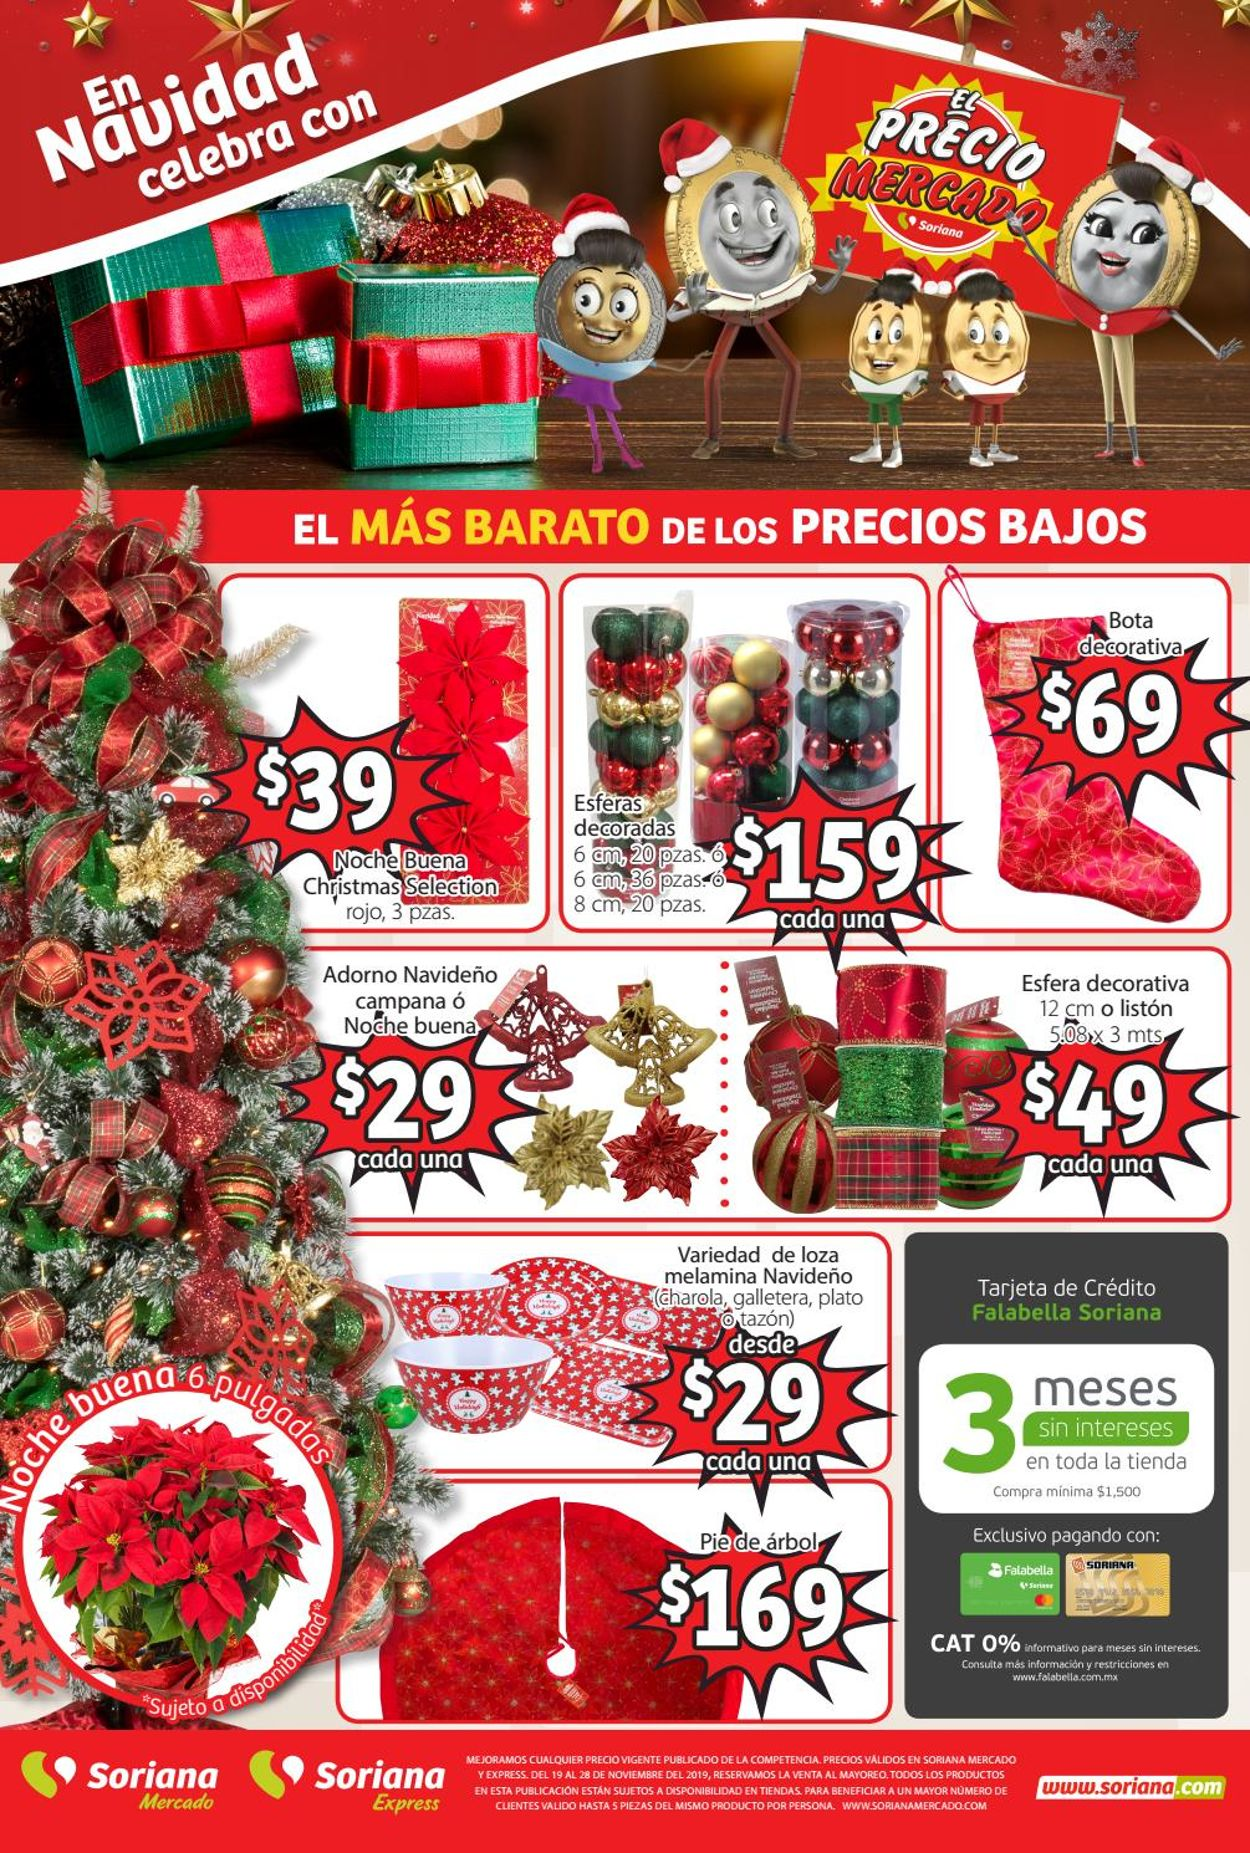 Soriana Catálogo Navideño Folleto - 19.11-28.11.2019